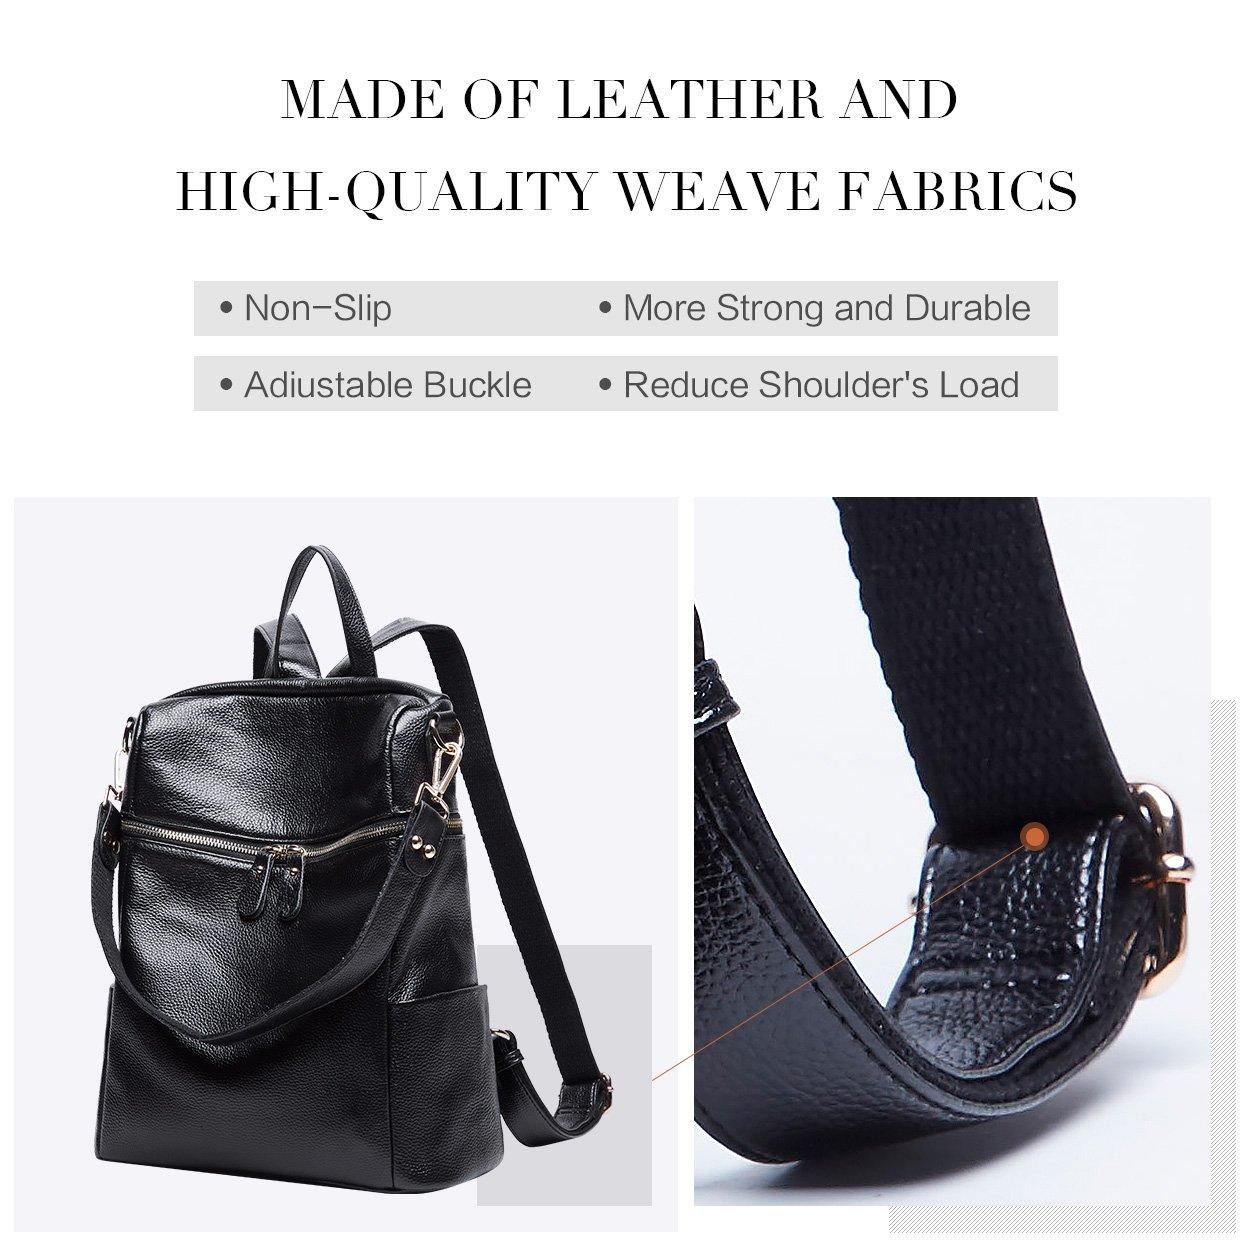 BOYATU Convertible Genuine Leather Backpack Purse for Women Fashion Travel Bag (Black) by BOYATU (Image #8)